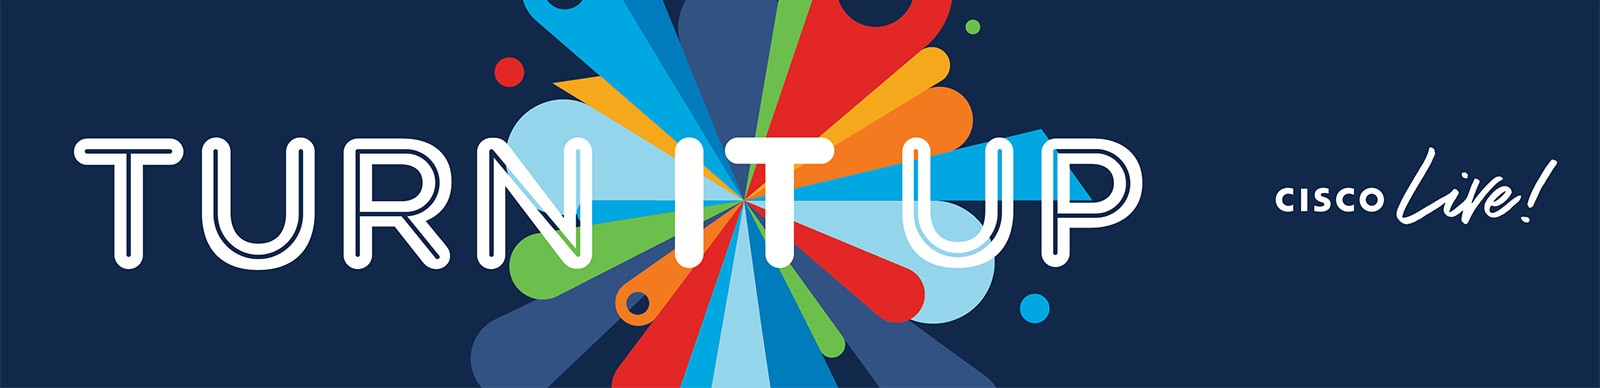 Turn it up - Cisco Live